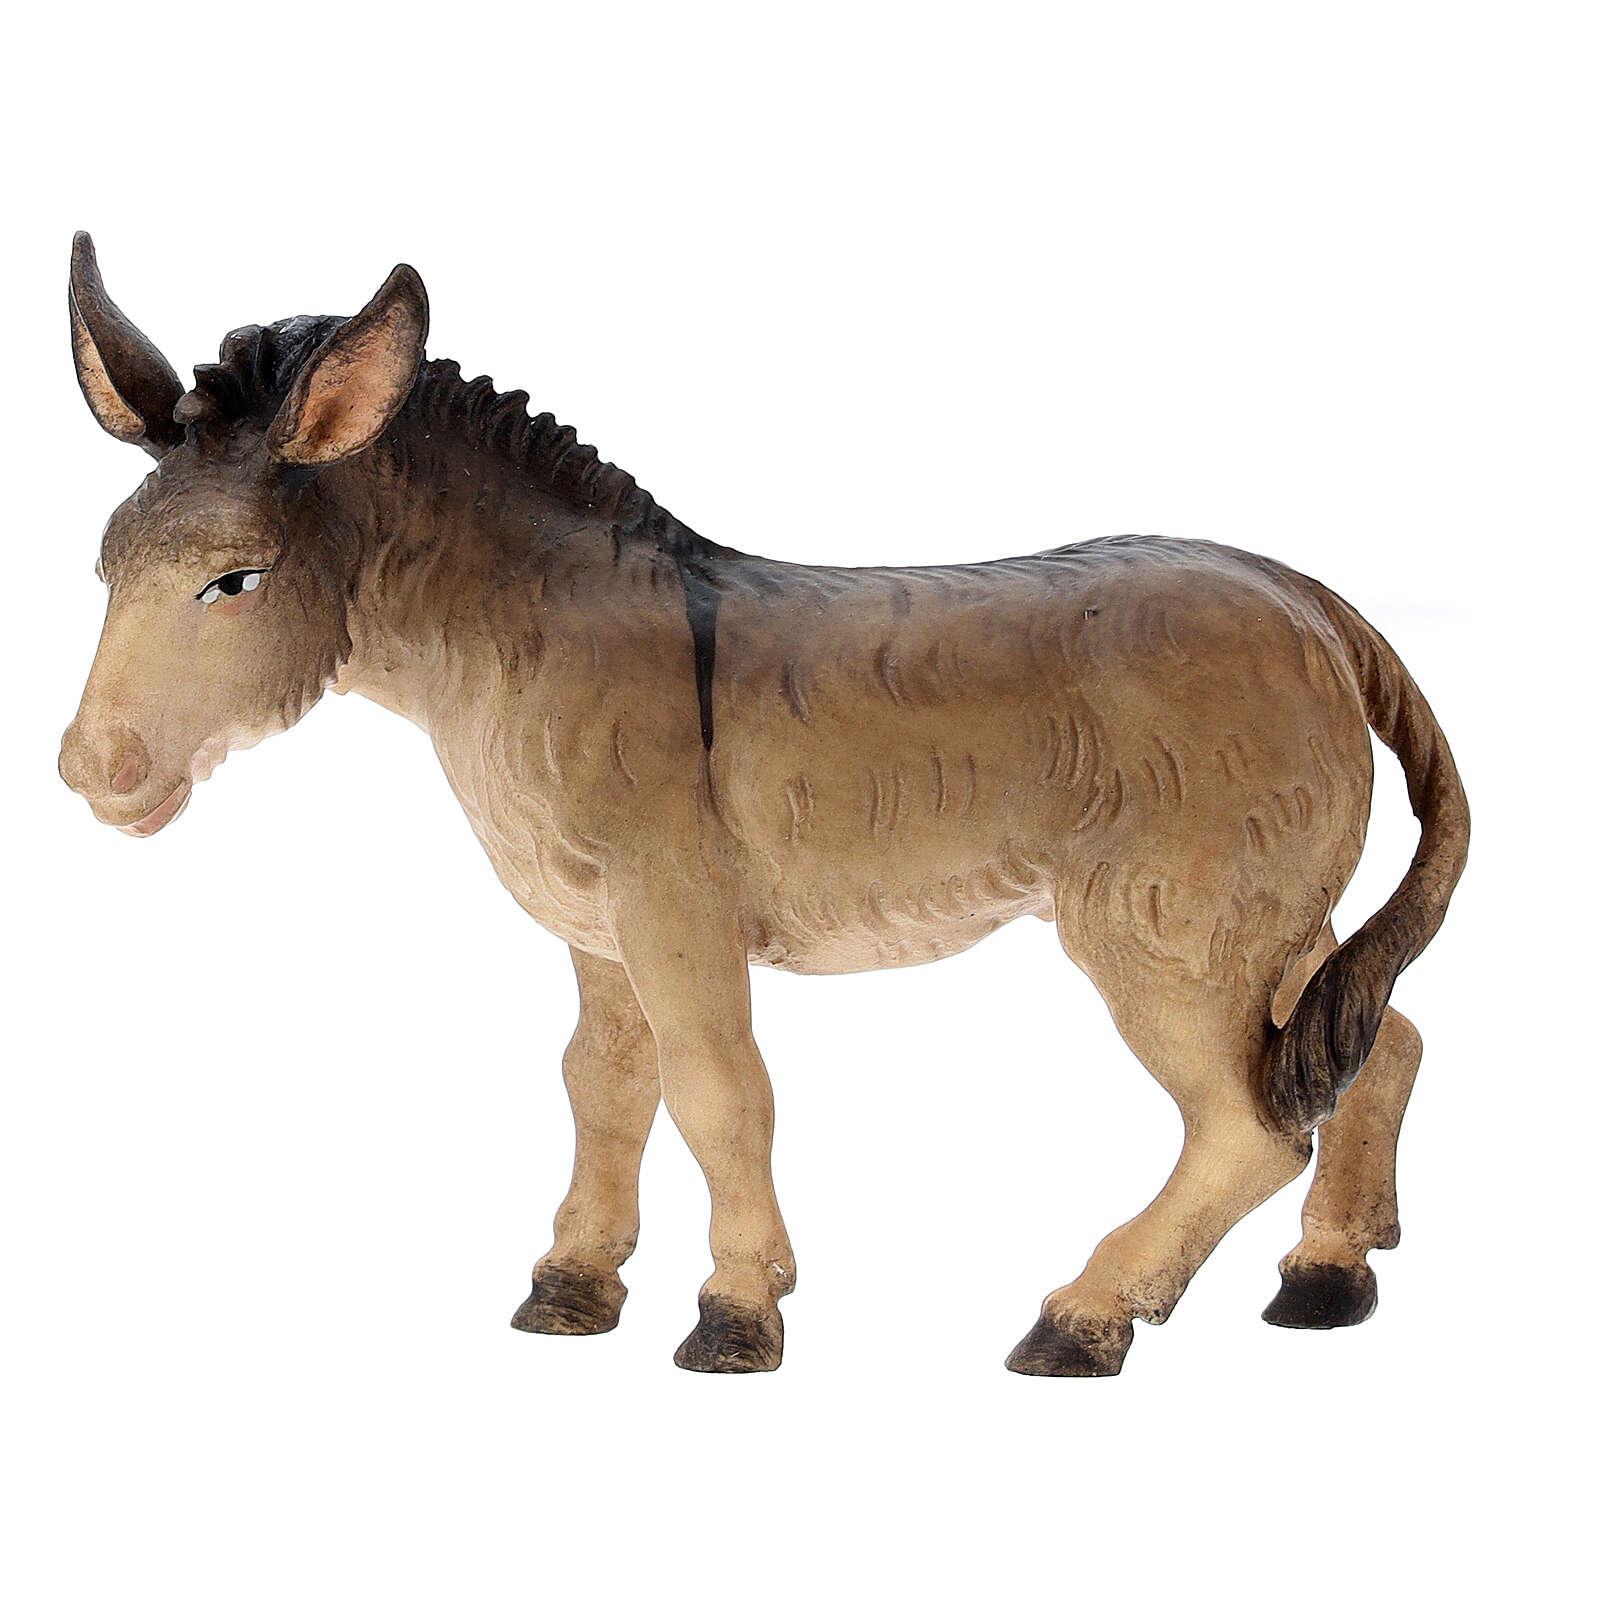 Donkey and Ox Figurines, 12 cm Nativity Original Shepherd model, in painted Val Gardena wood 4